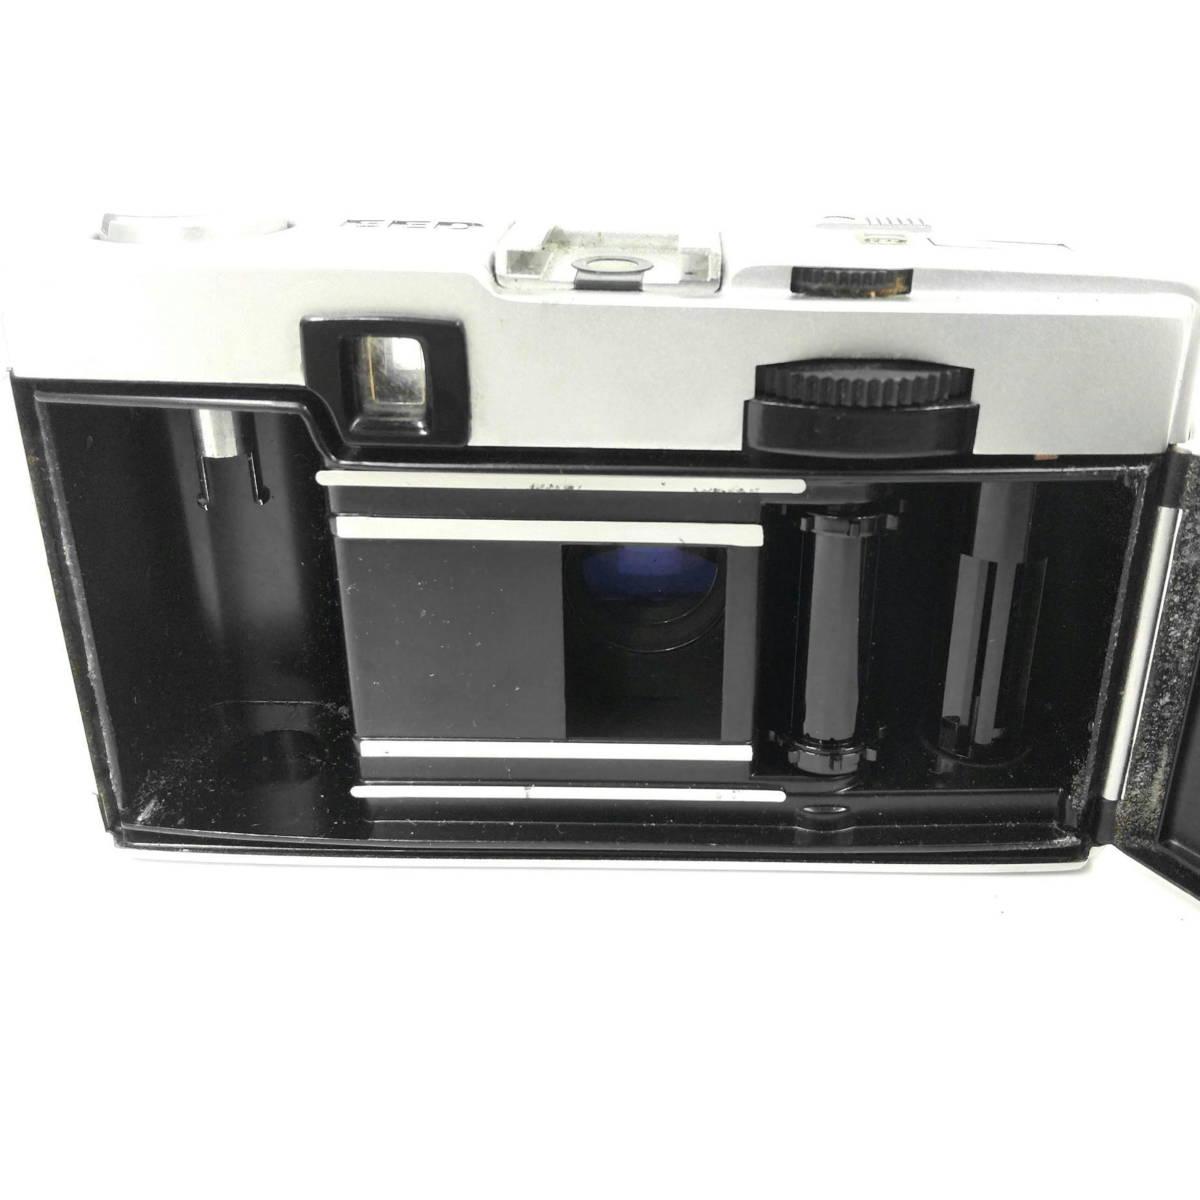 OLYMPUS-PEN EED オリンパスペン 短焦点レンズ F.Zuiko f1.7 32mm_画像5